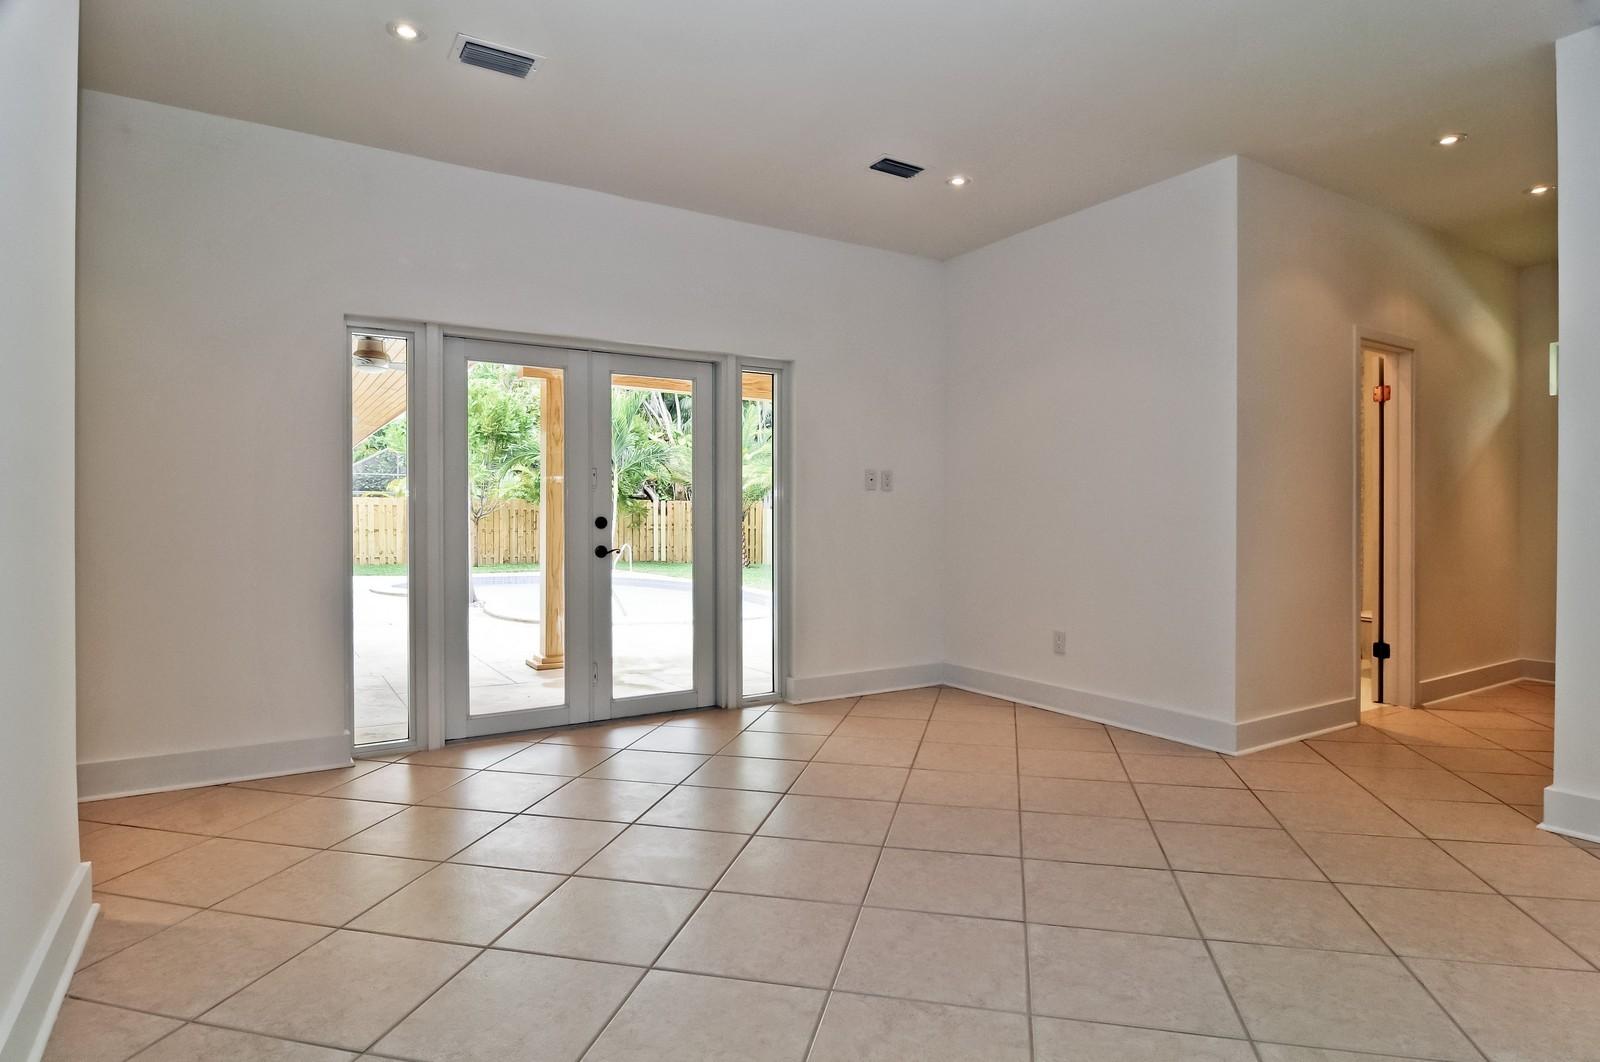 Real Estate Photography - 3645 Battersea, Miami, FL, 33133 - Master Bedroom